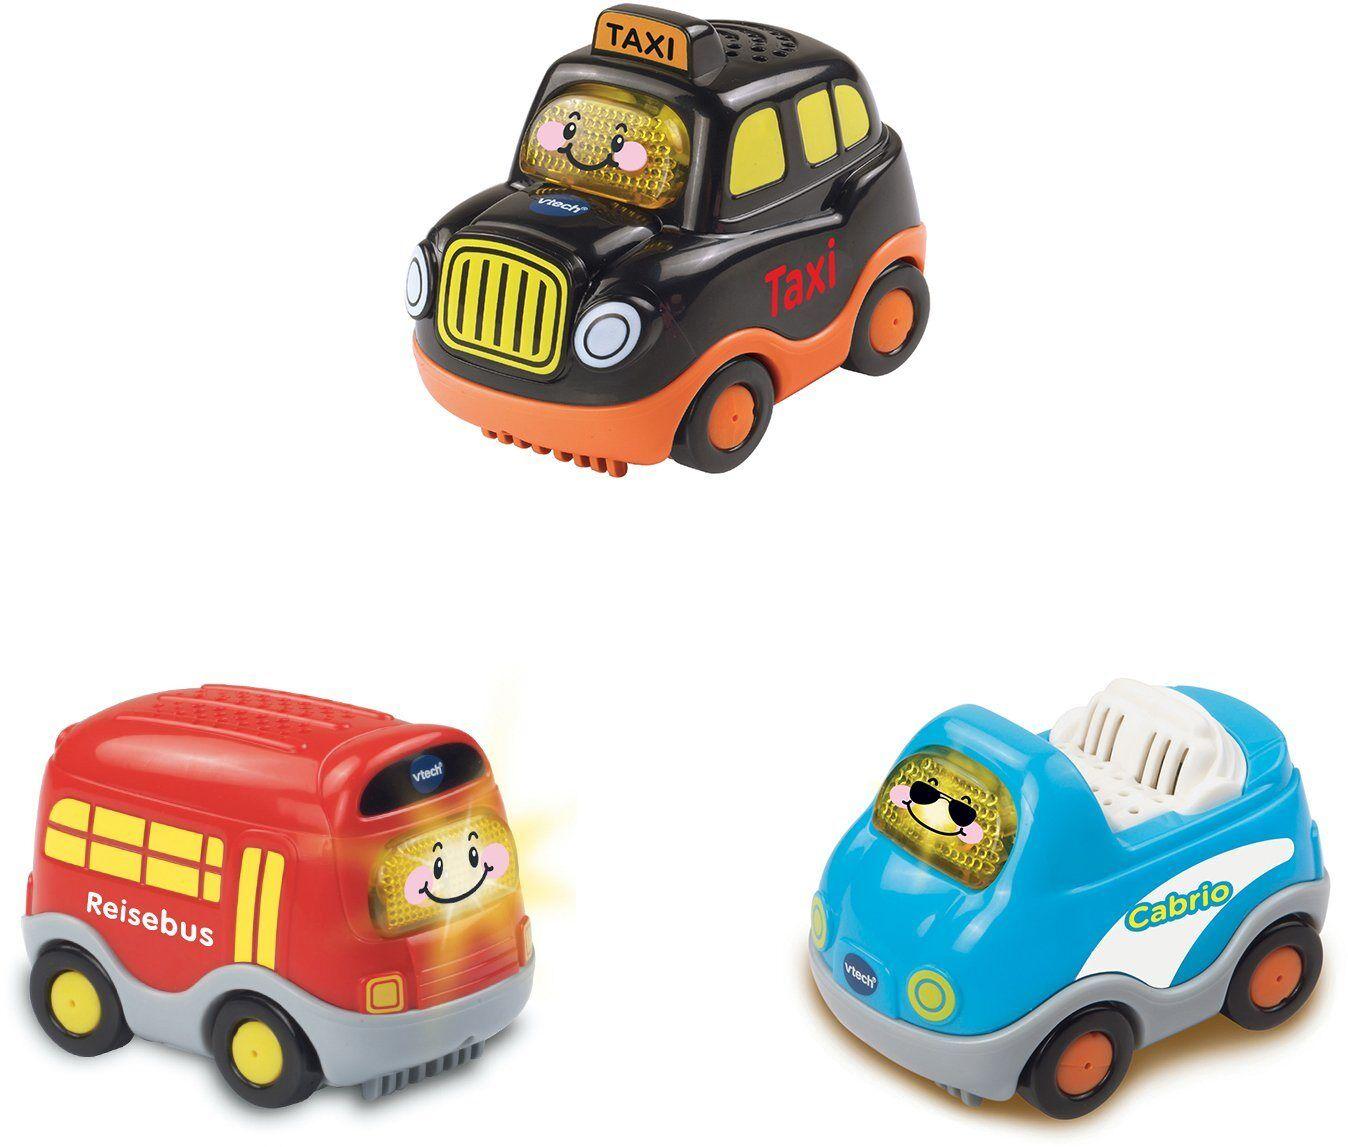 Vtech® Spielzeug-Auto »Tut Tut Baby Flitzer«, (Set), mit Taxi, Reisebus, Cabrio, bunt